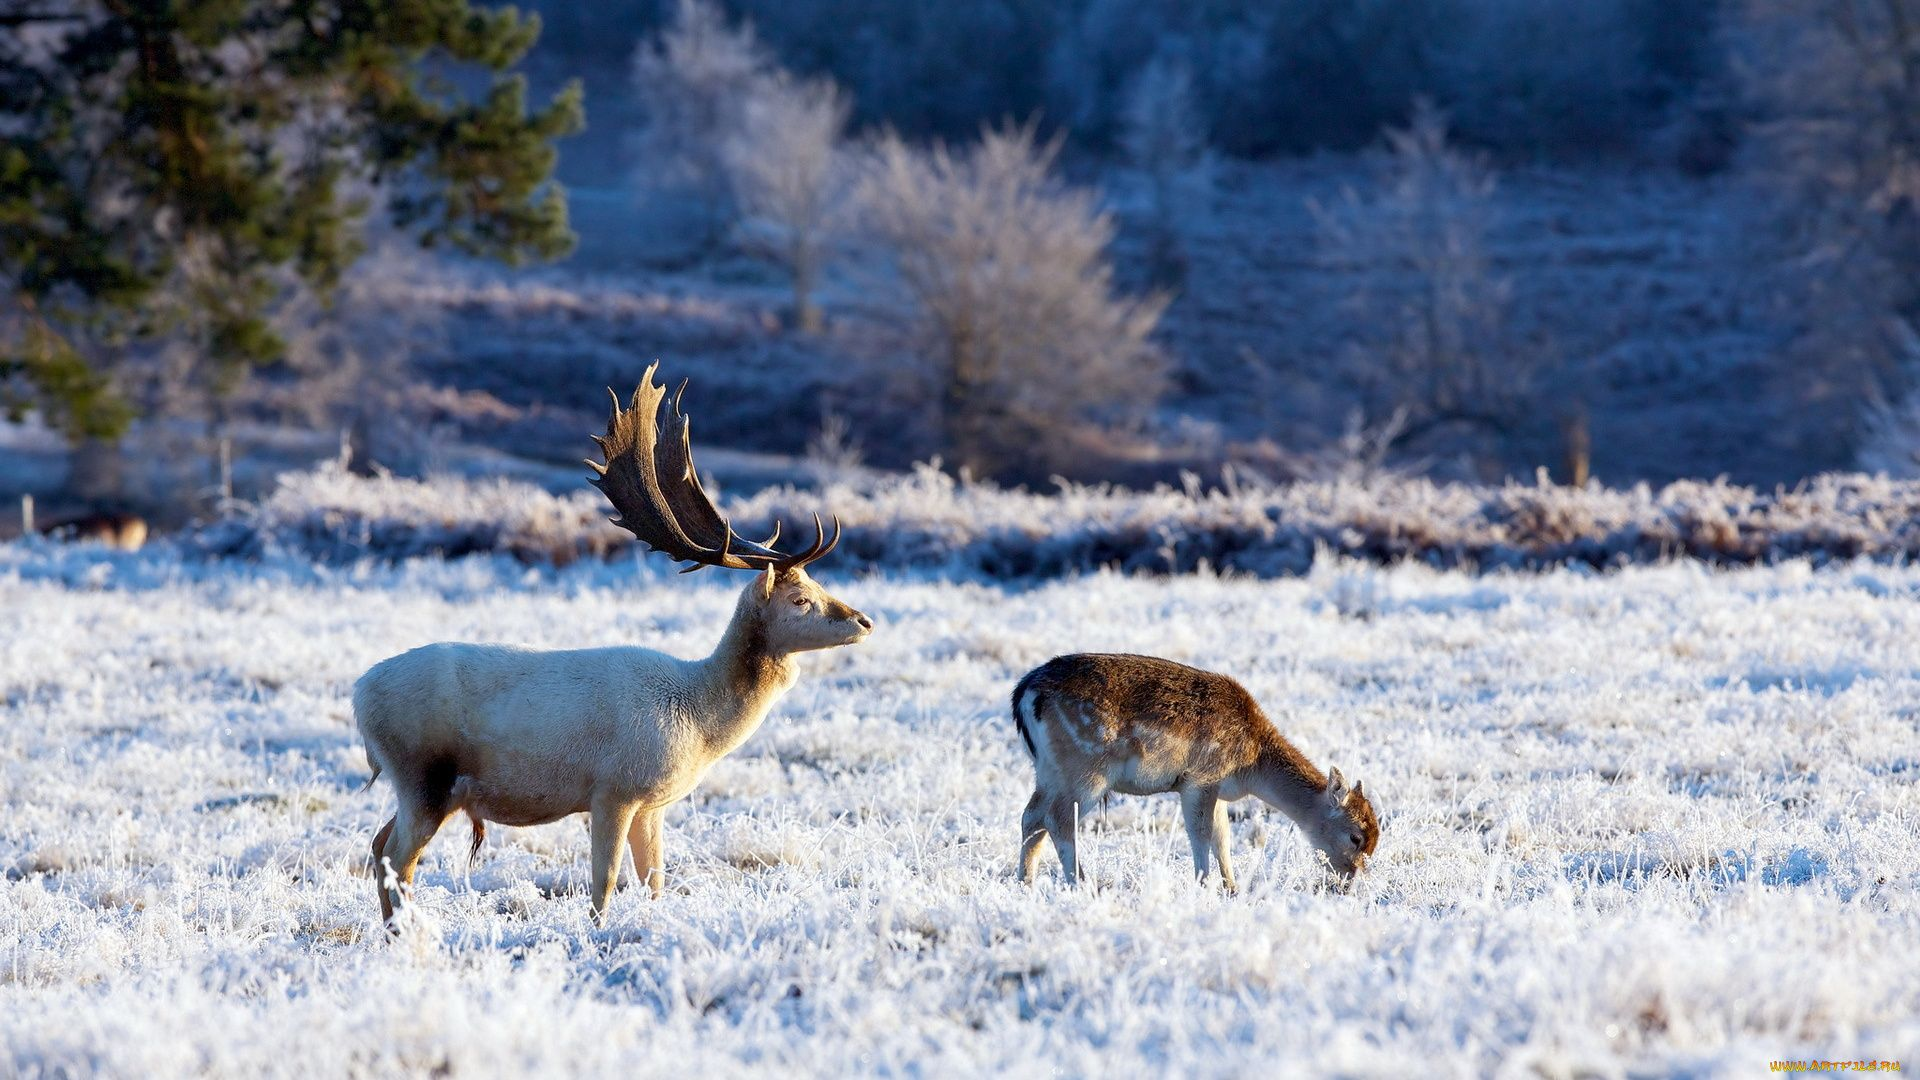 Nature Forest Animals Winter